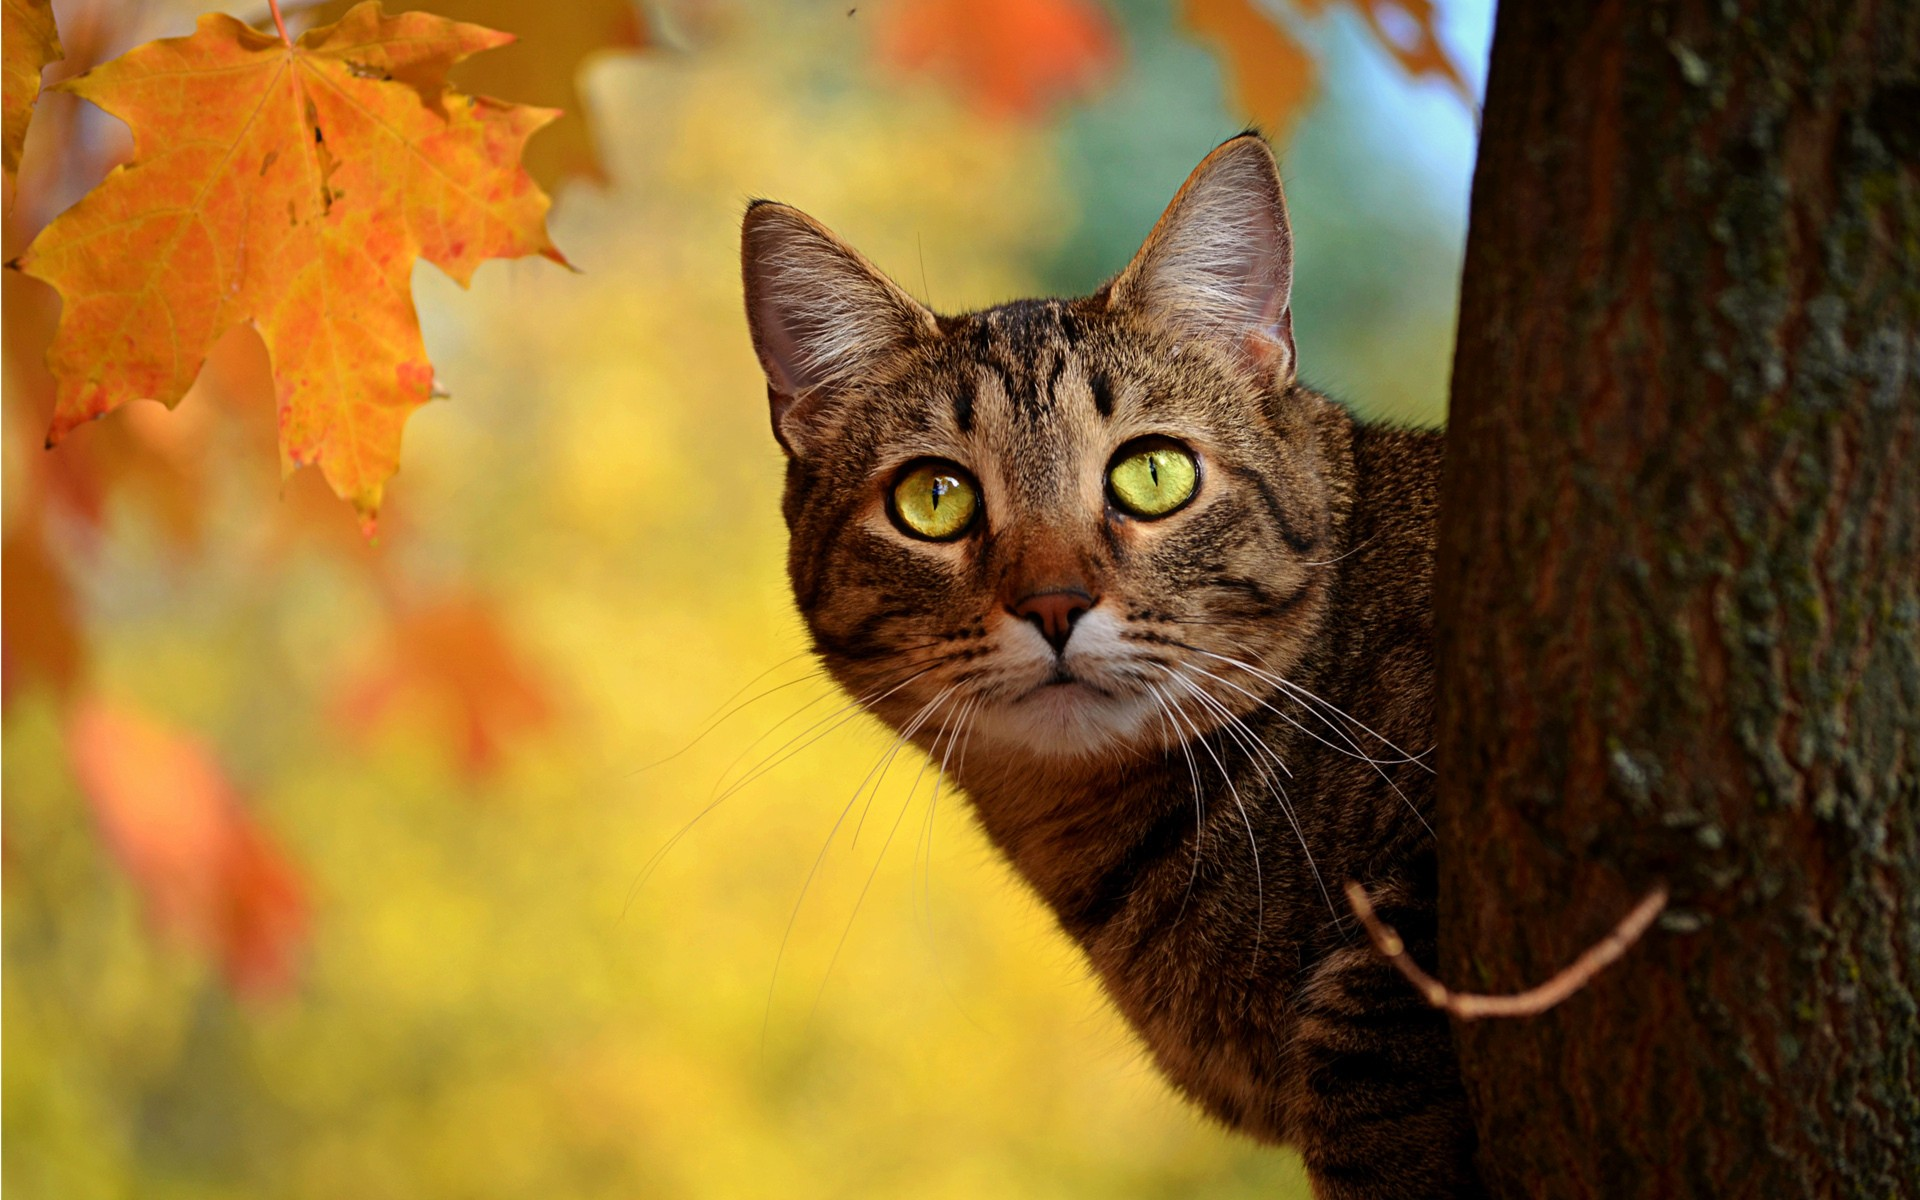 Un gato en un árbol - 1920x1200